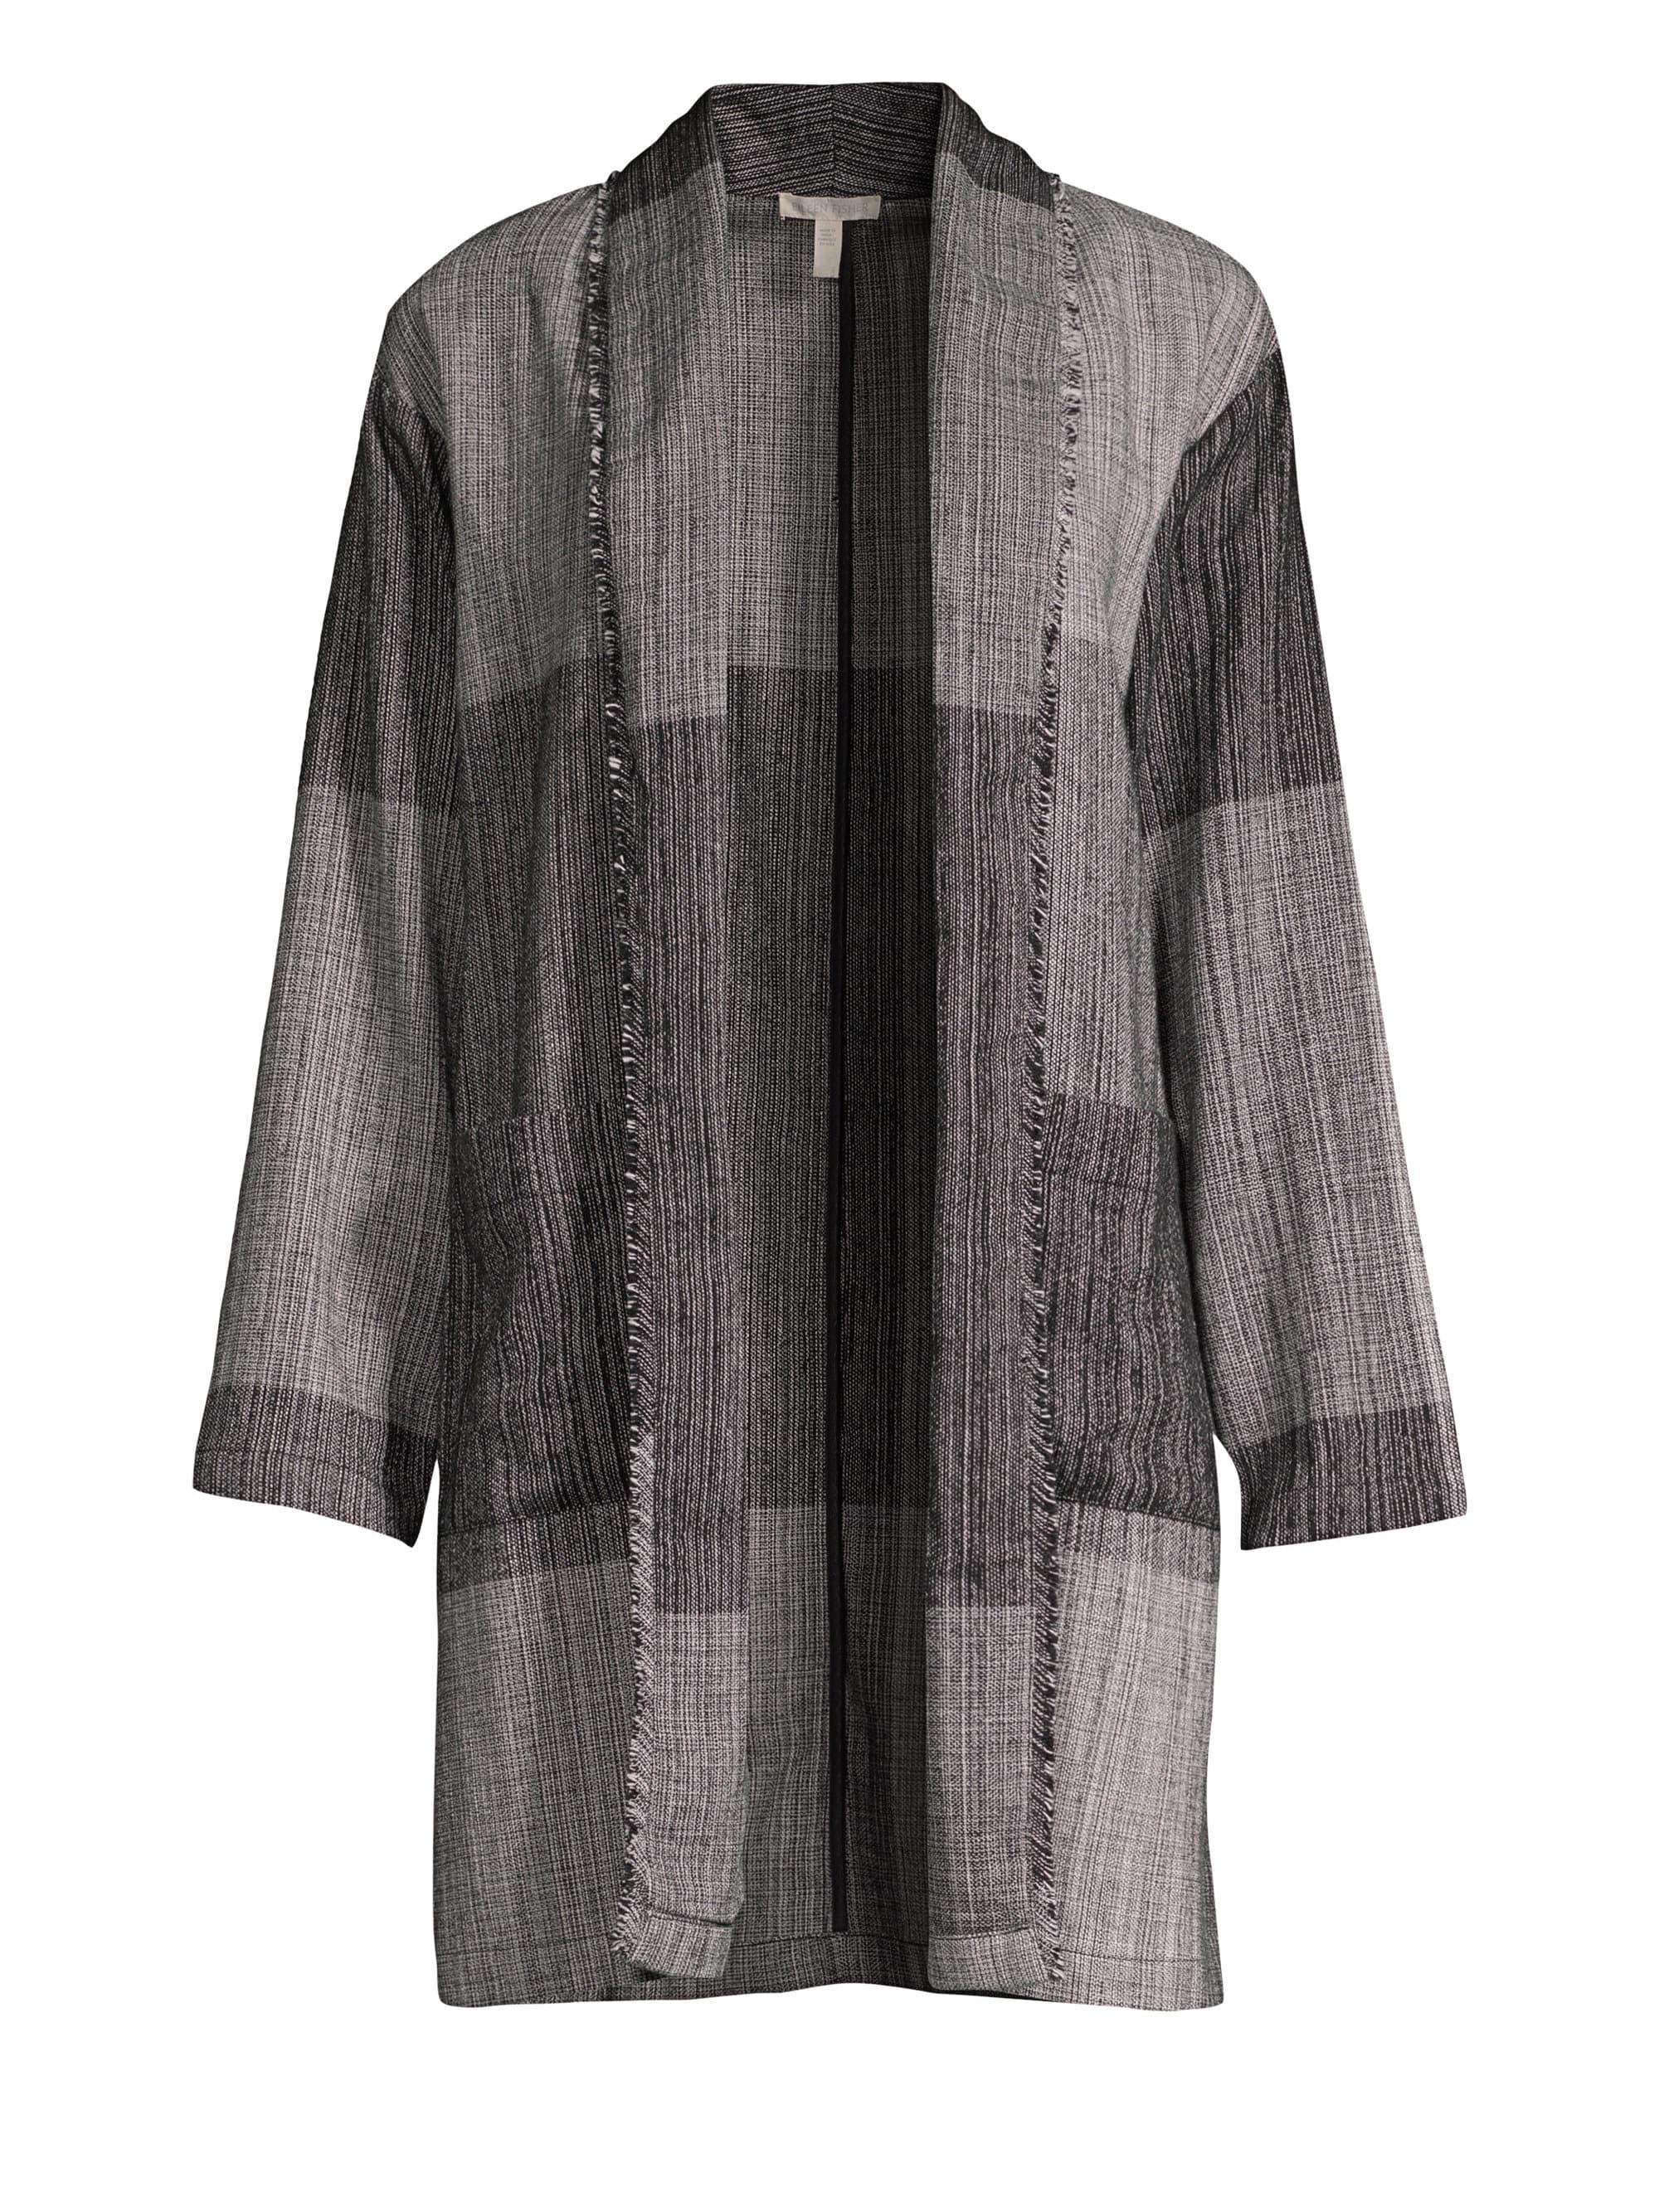 66078f70bd08b Lyst - Eileen Fisher Women s Shawl Collar Long Cotton Jacket - Black ...